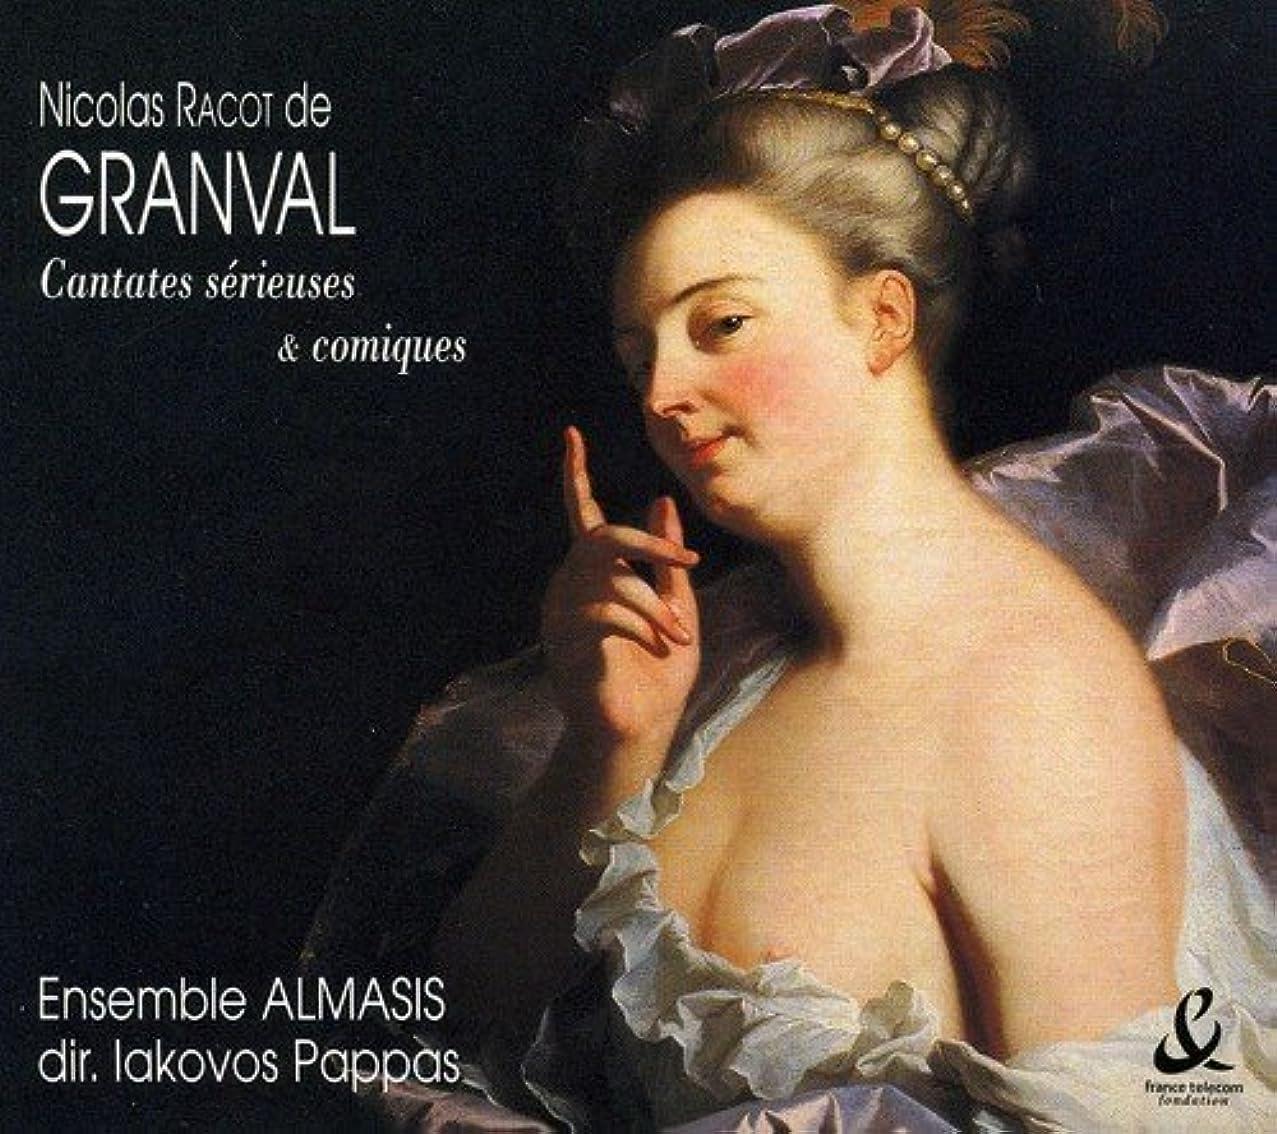 Granval: Cantates Serieuses & Comiques